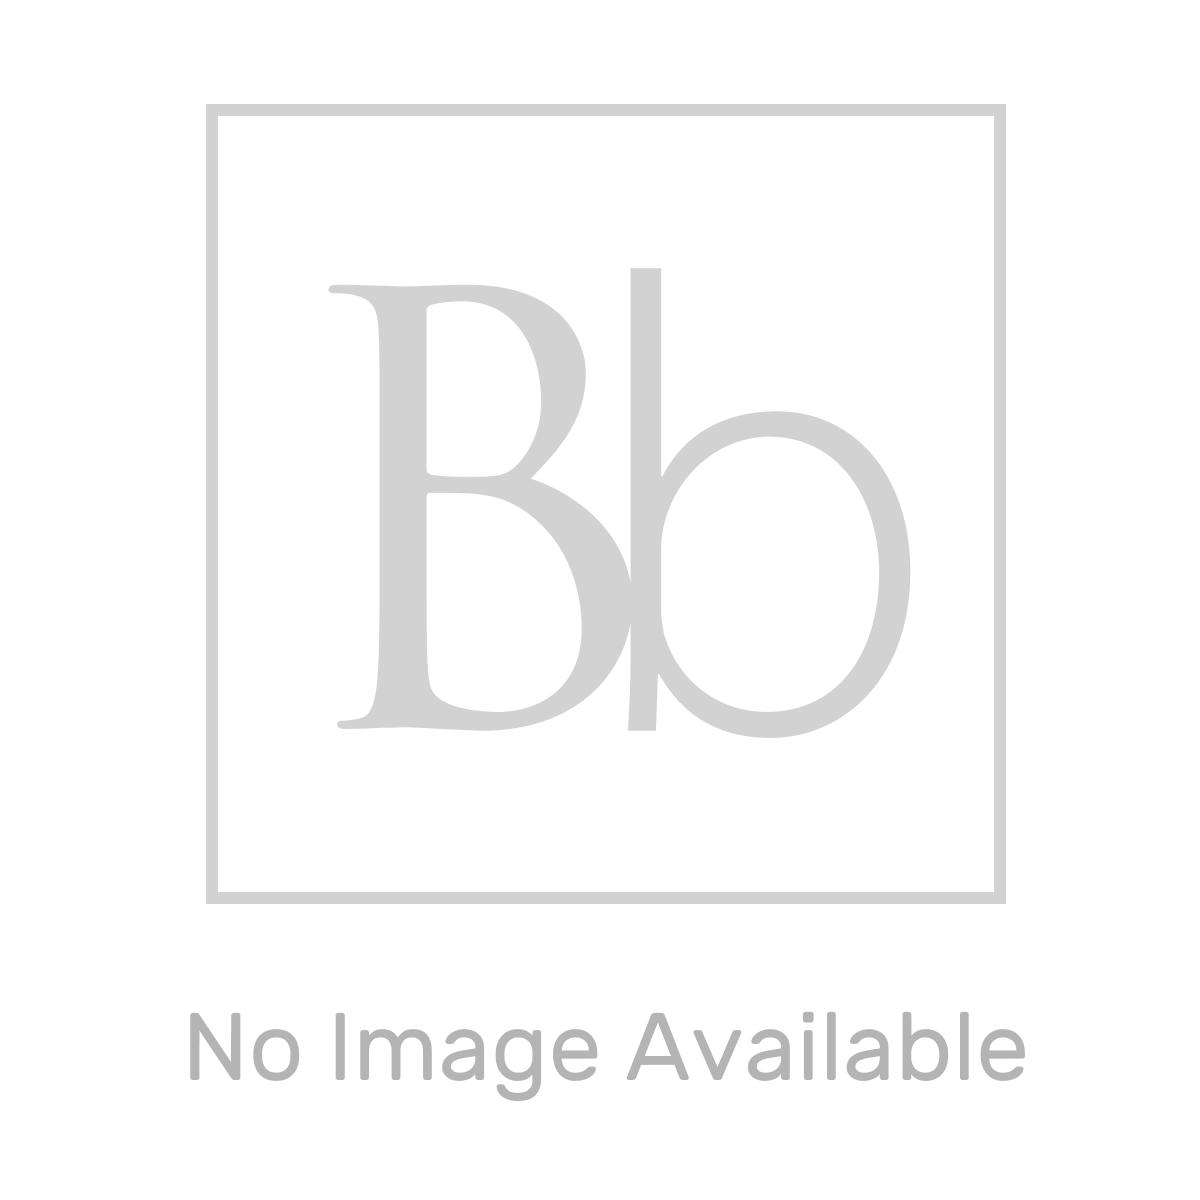 Elation Sendai White Gloss Washstand Unit with Basin 650mm Measurements